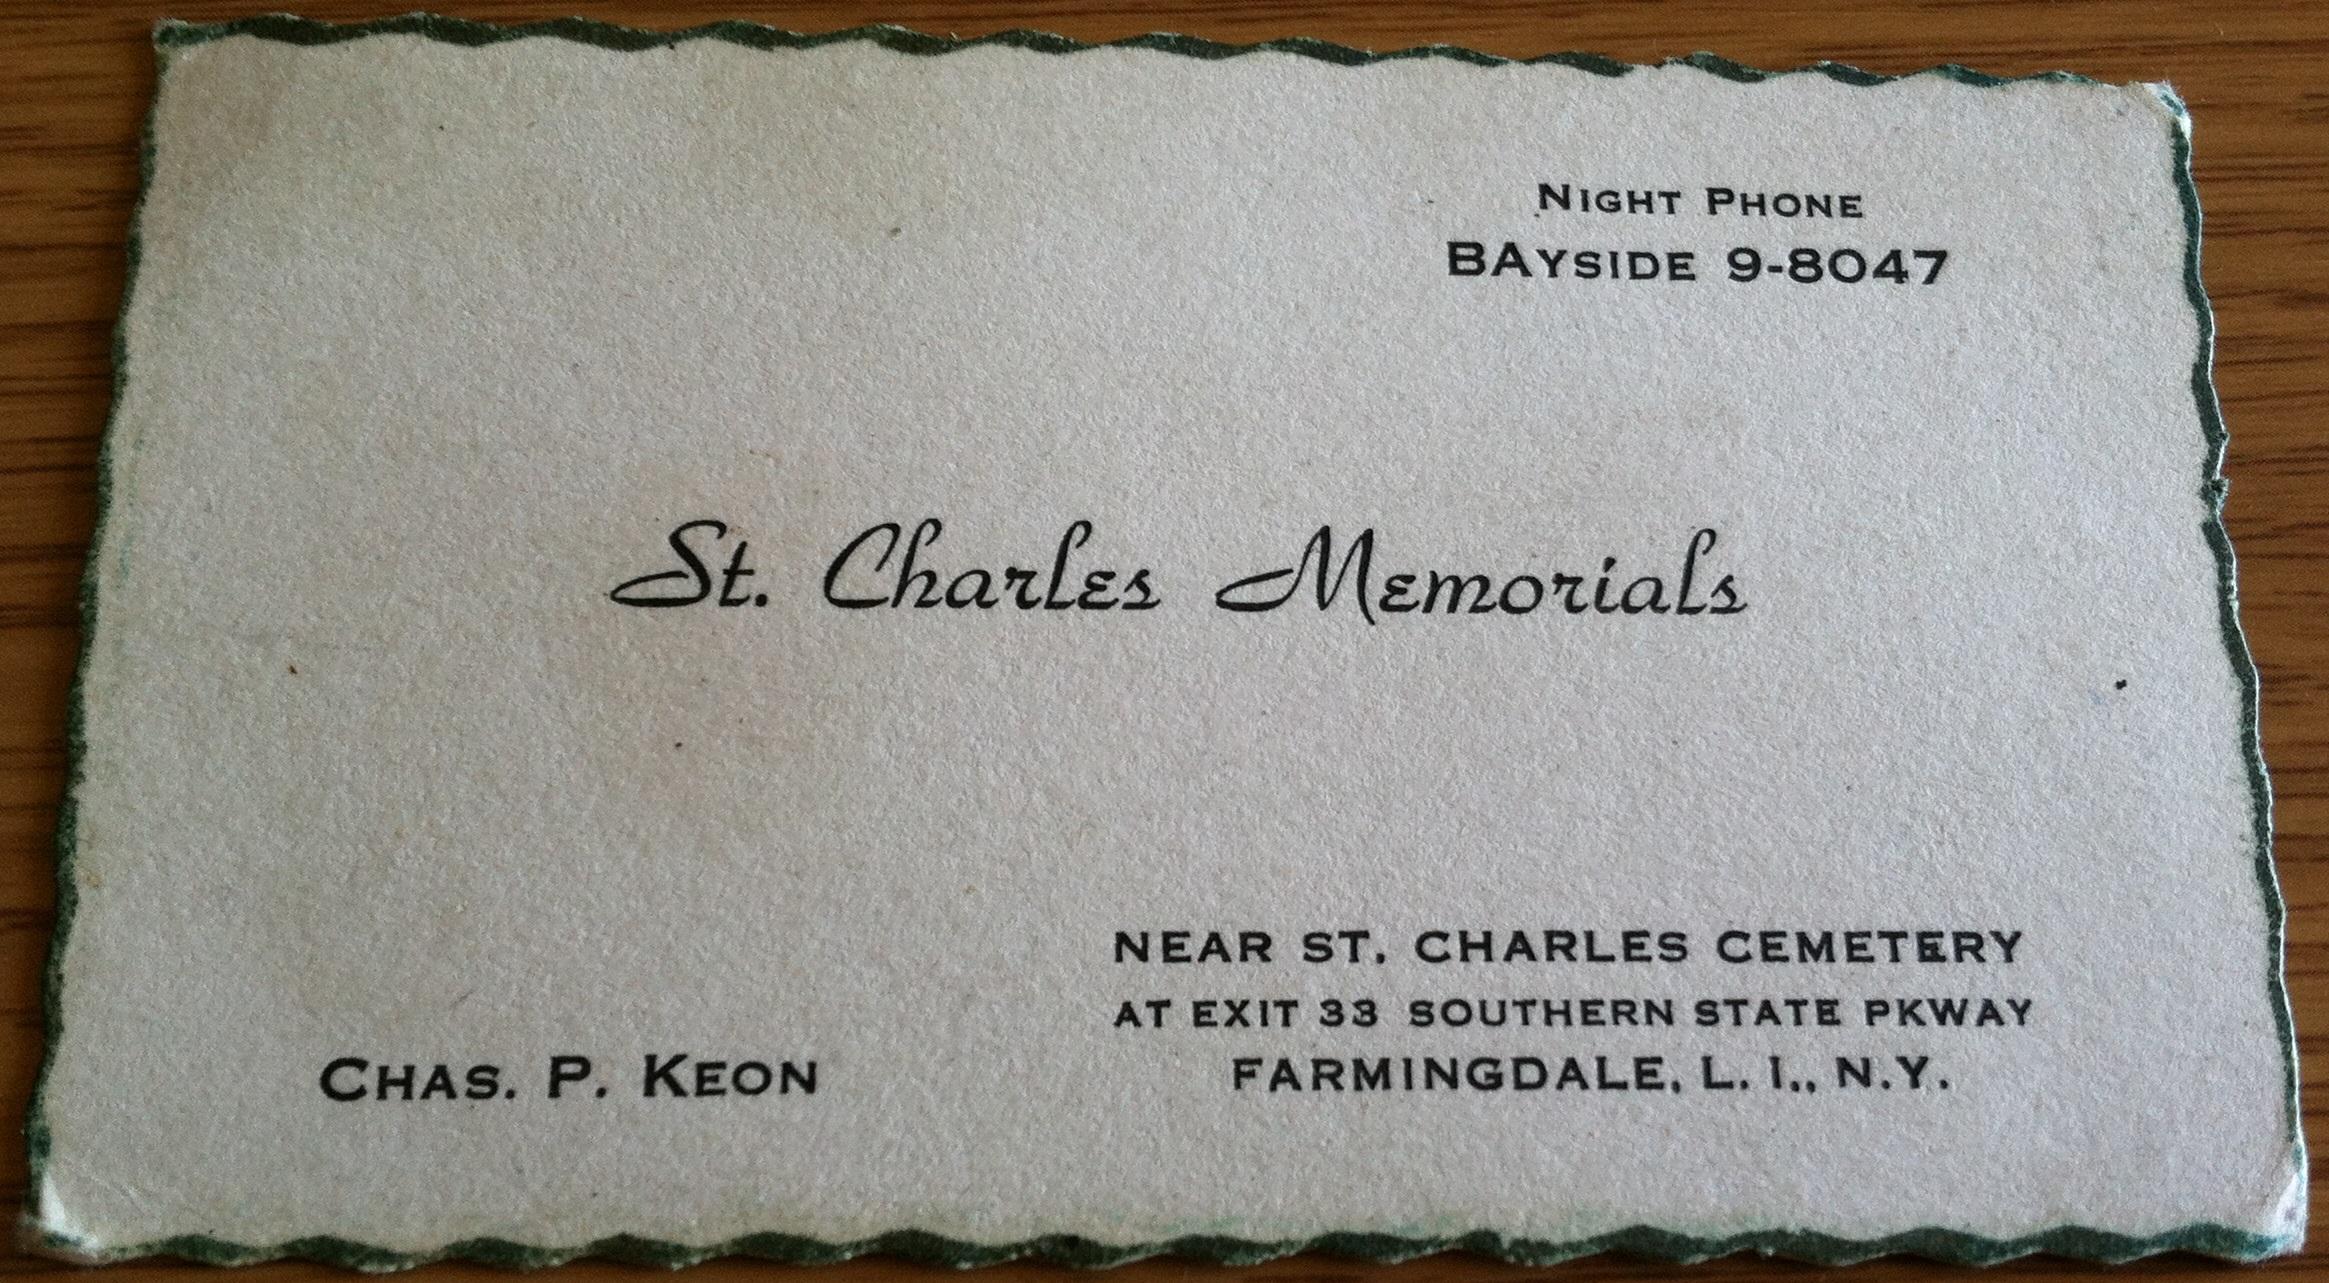 St Charles Memorials